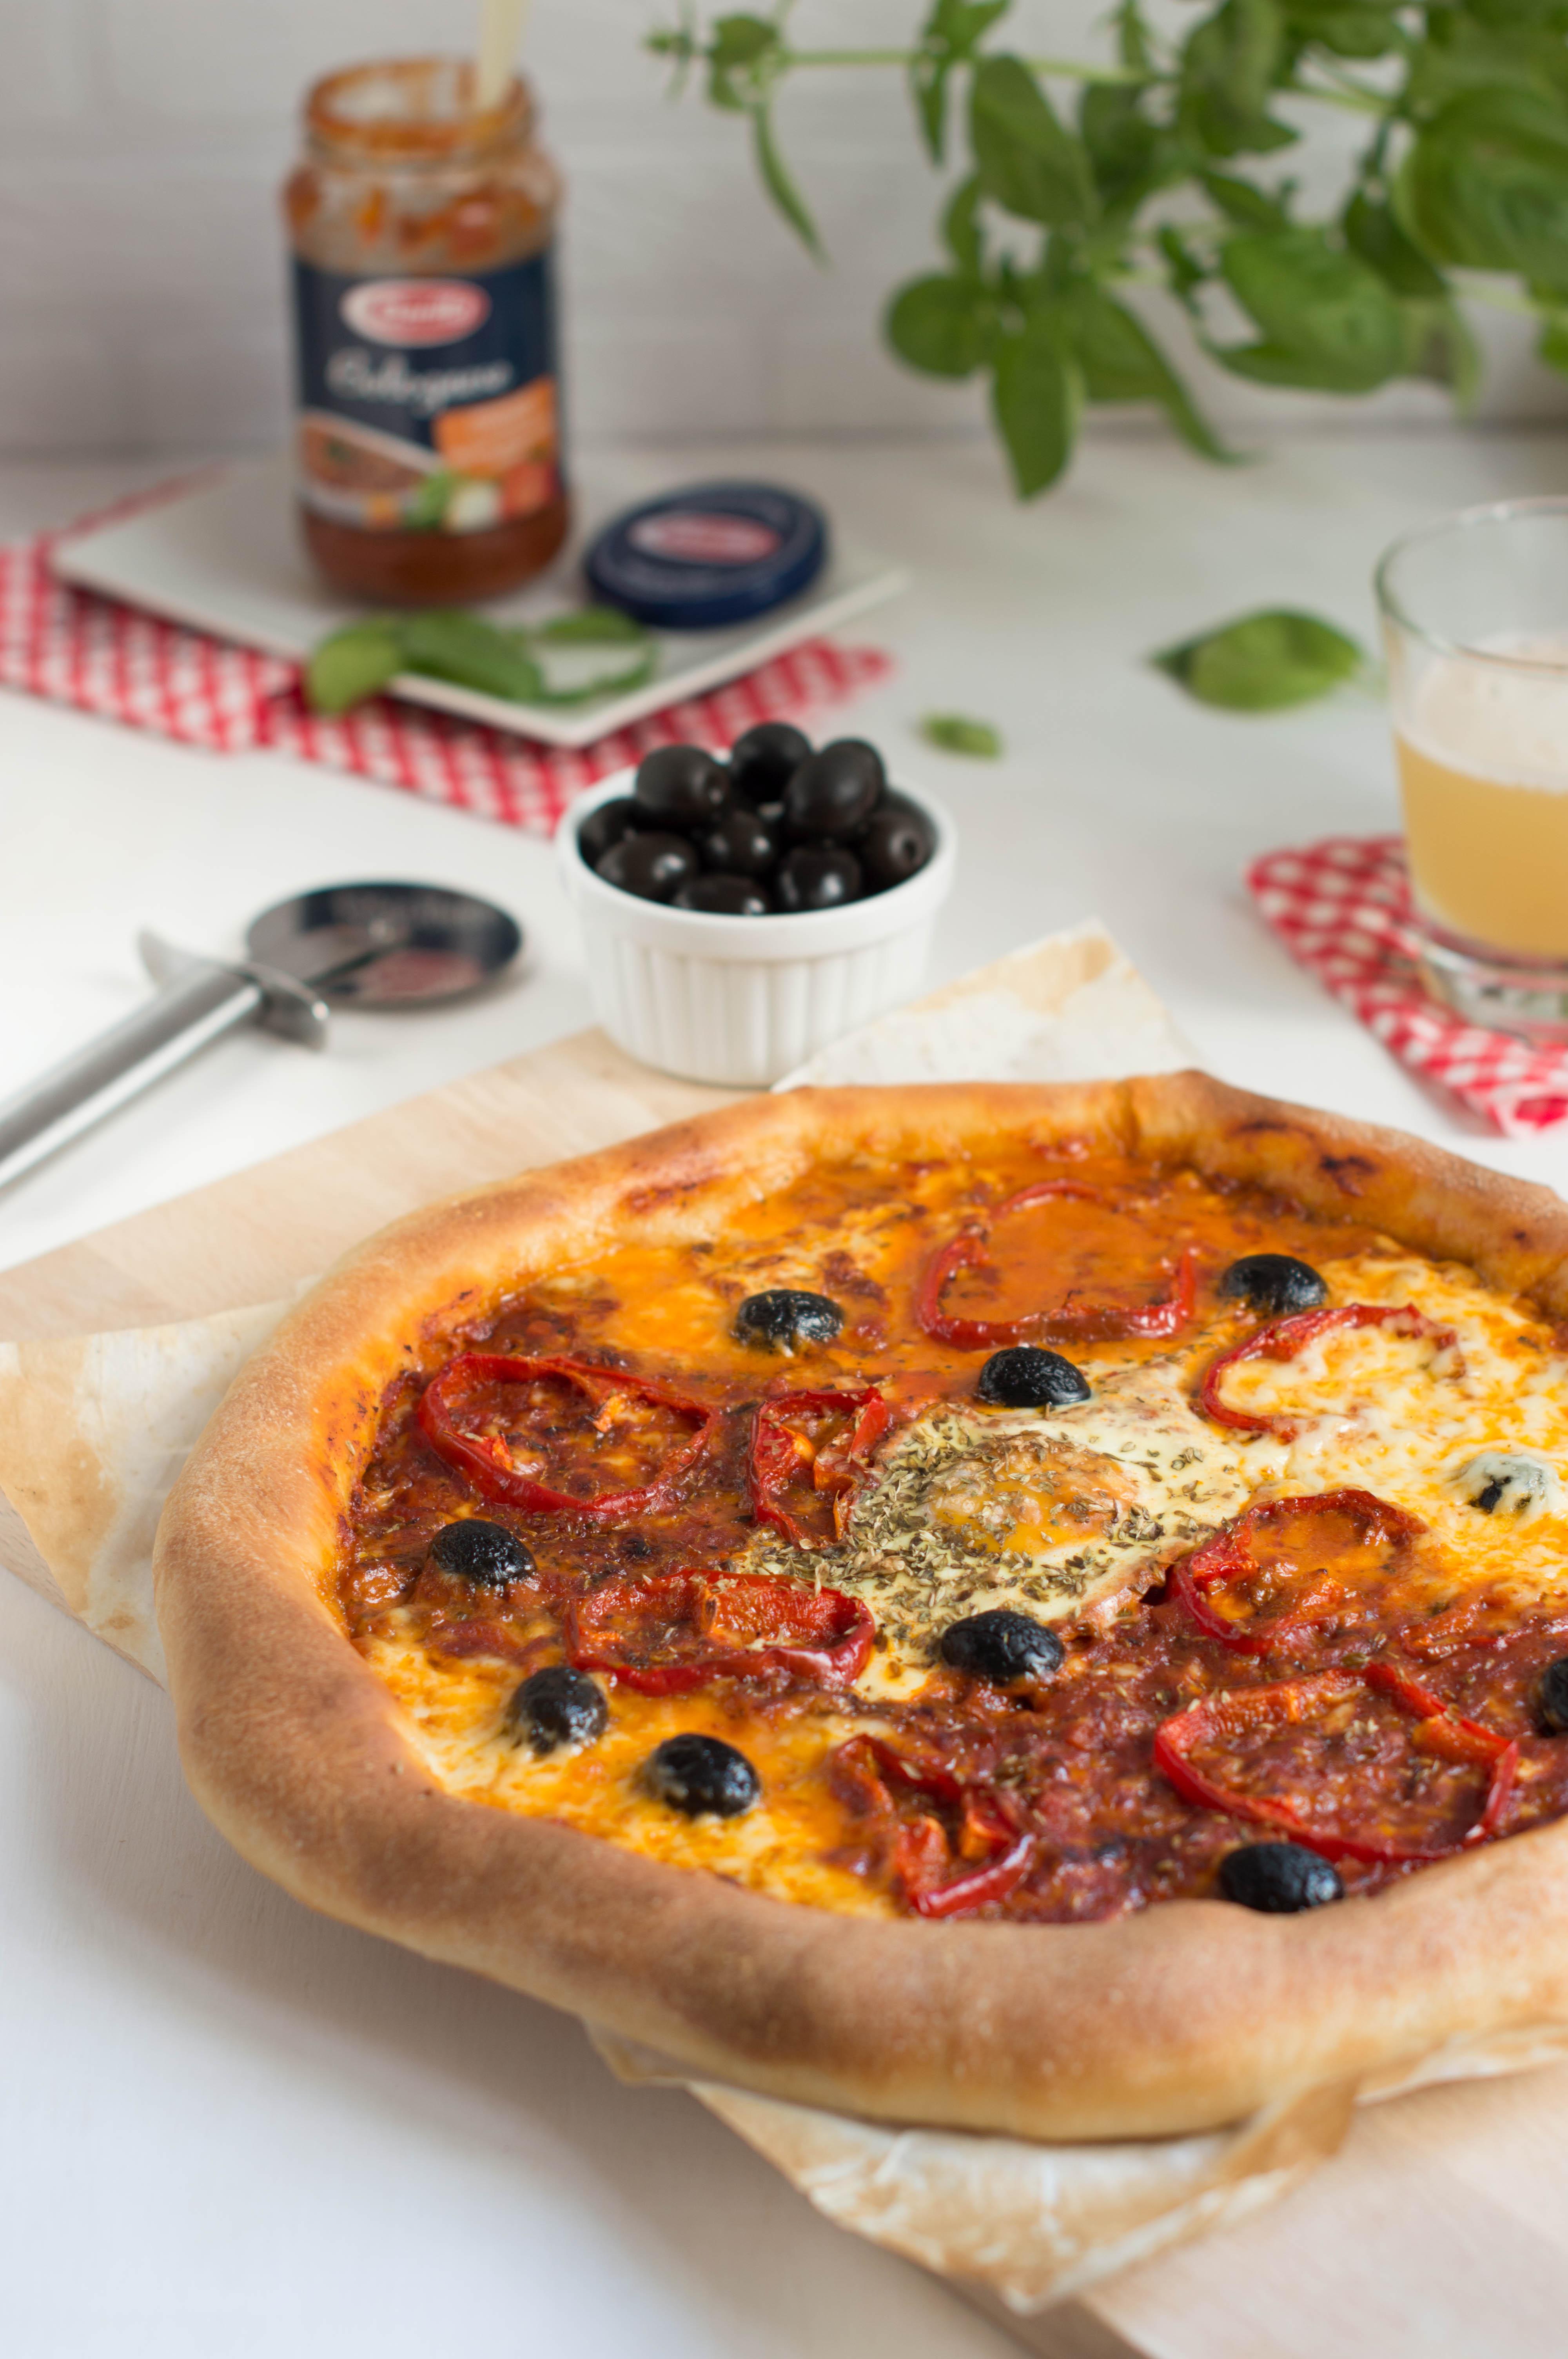 Pizza boloñesa con bordes rellenos de queso - Barilla